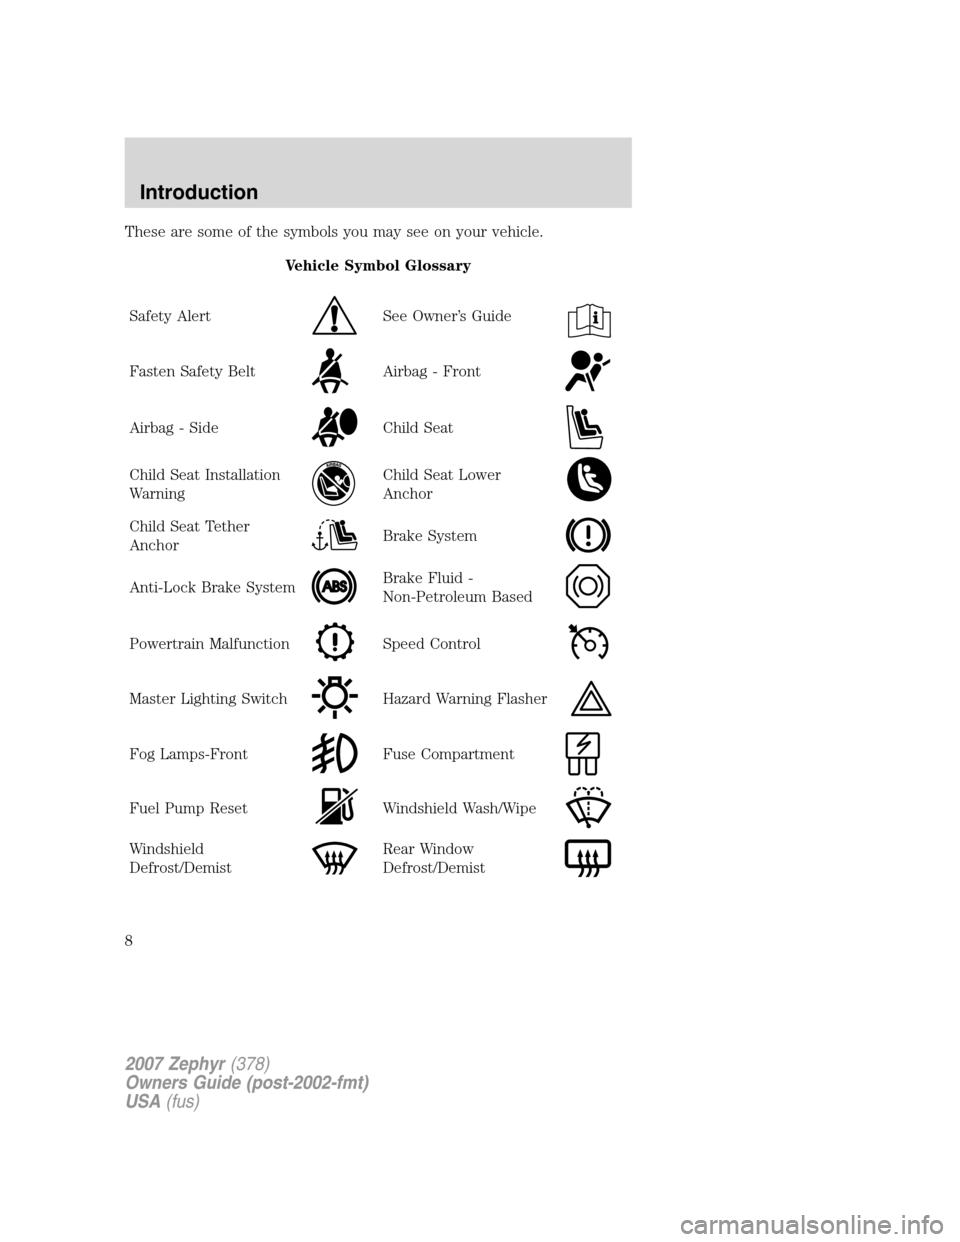 lincoln mkz 2007 owners manual rh carmanualsonline info 2007 lincoln mkx owners manual pdf 2007 lincoln mkz owners manual